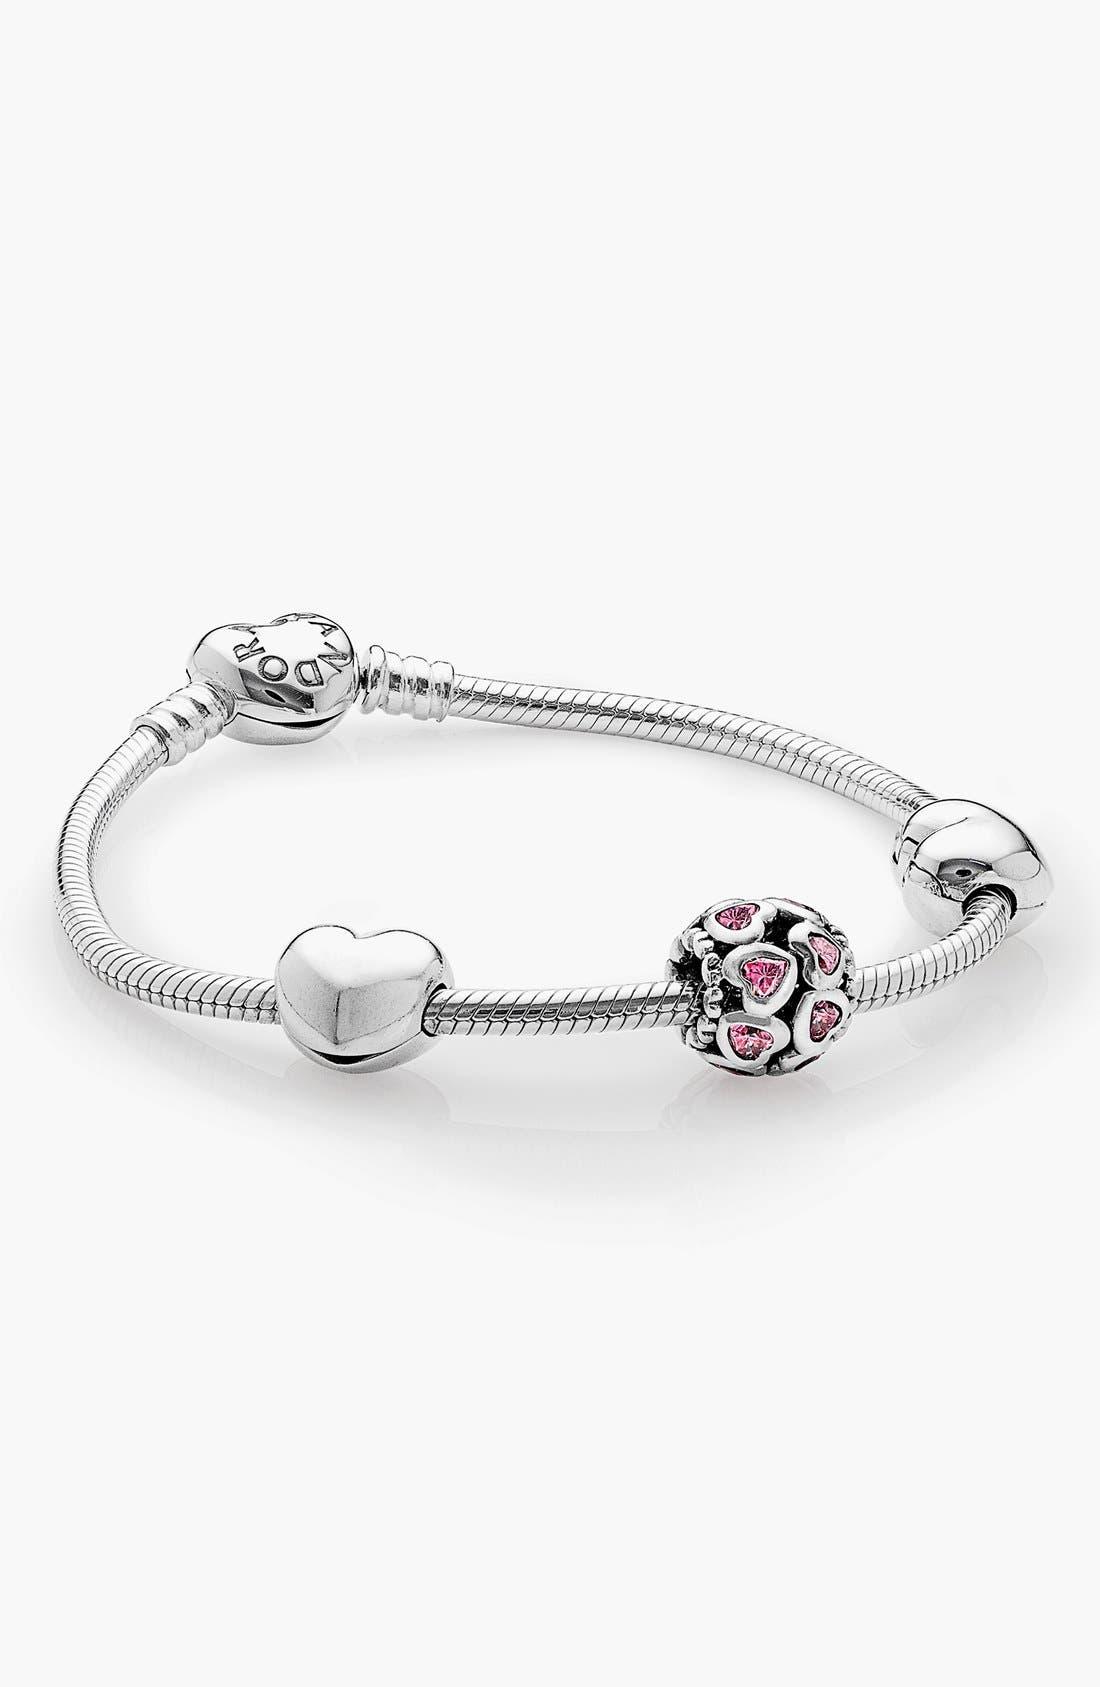 Main Image - PANDORA 'From the Heart' Boxed Charm Bracelet Set